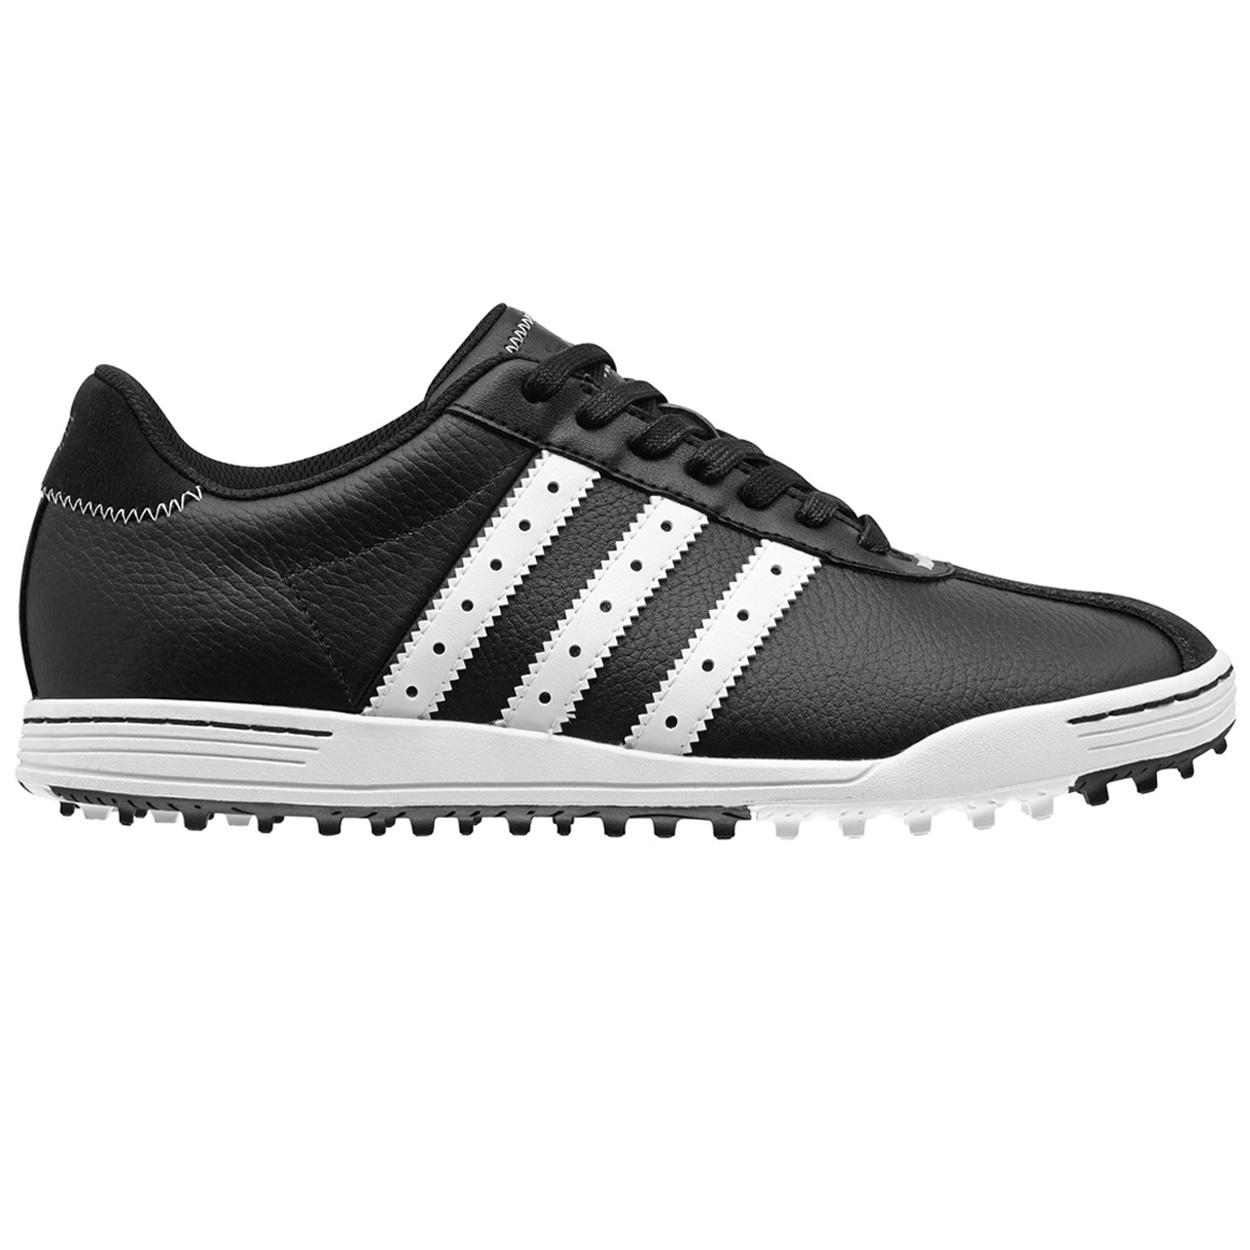 123705335cf Adidas CLOSEOUT Adicross Classic Men s Spikeless Golf Shoes ...